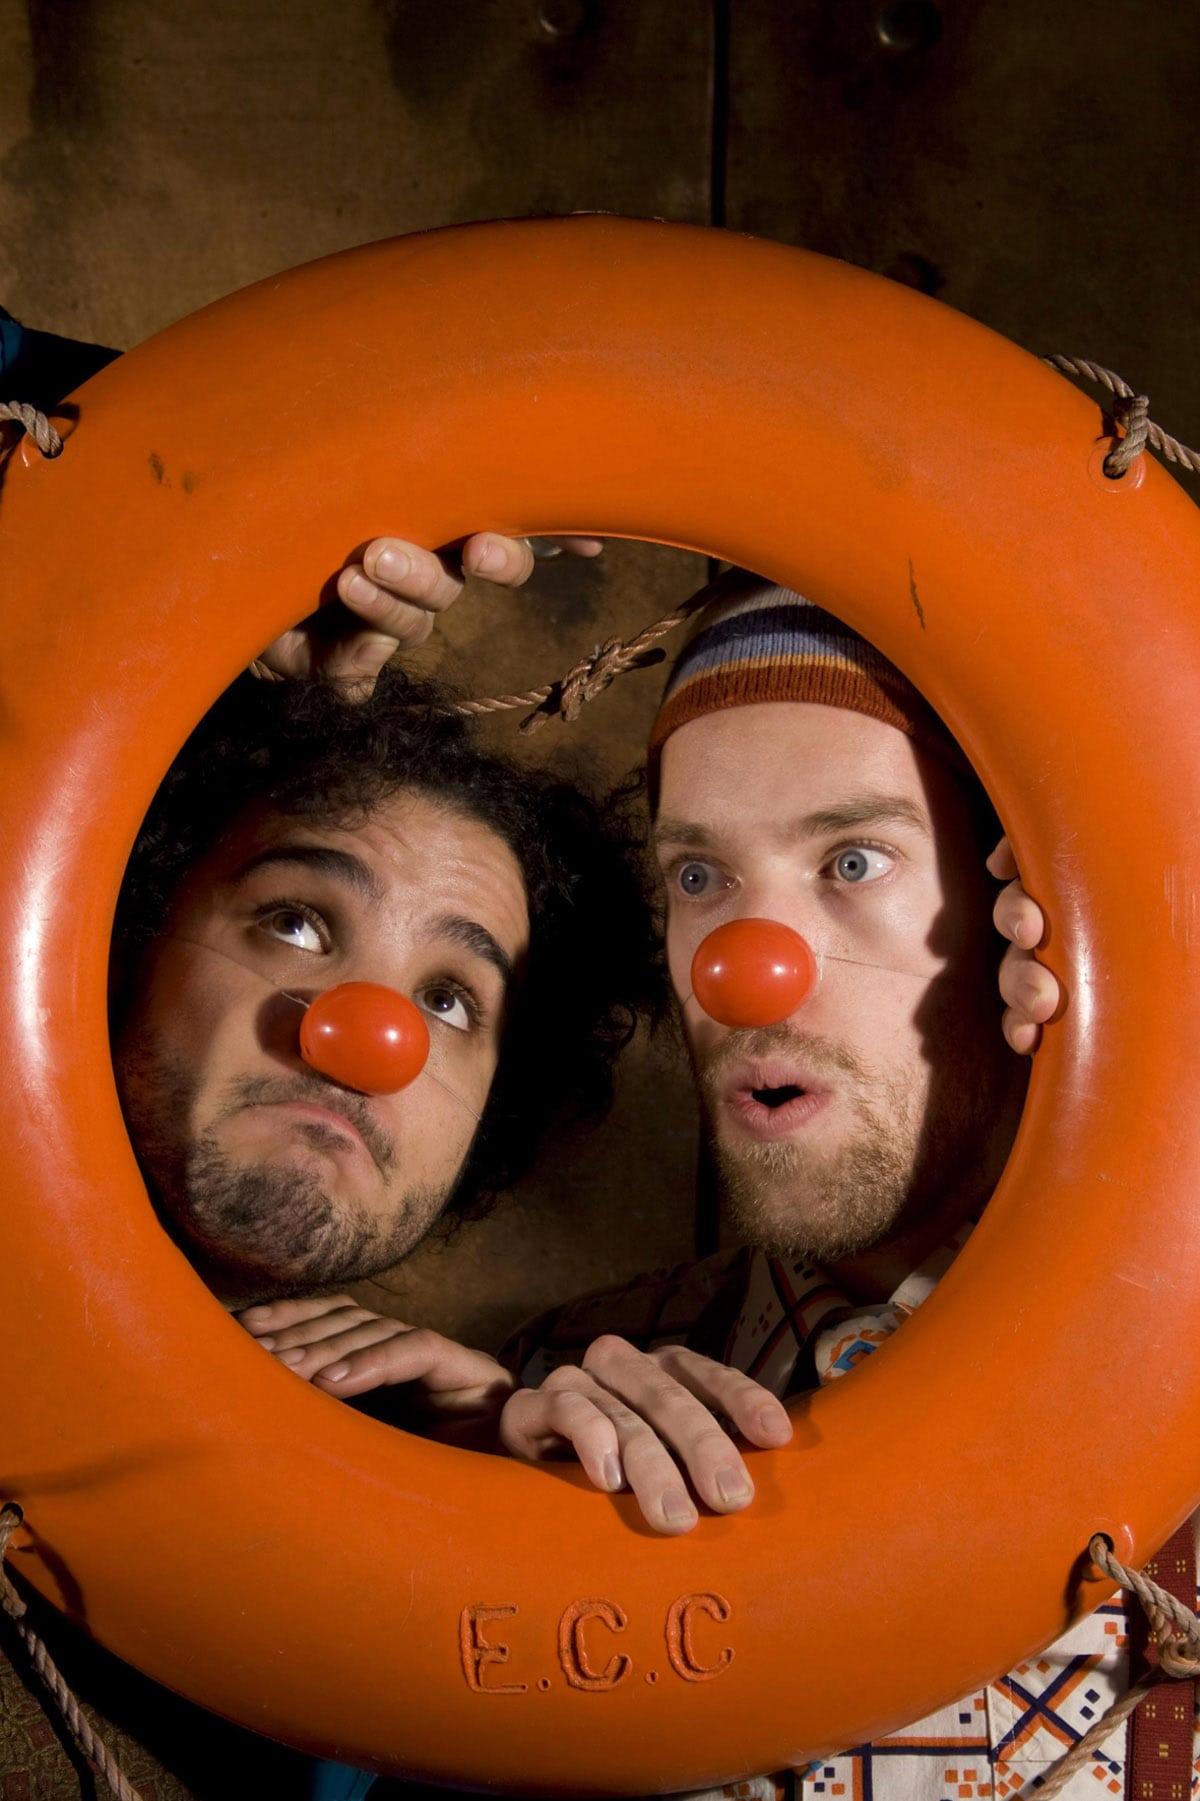 Ship of Fools' Performance